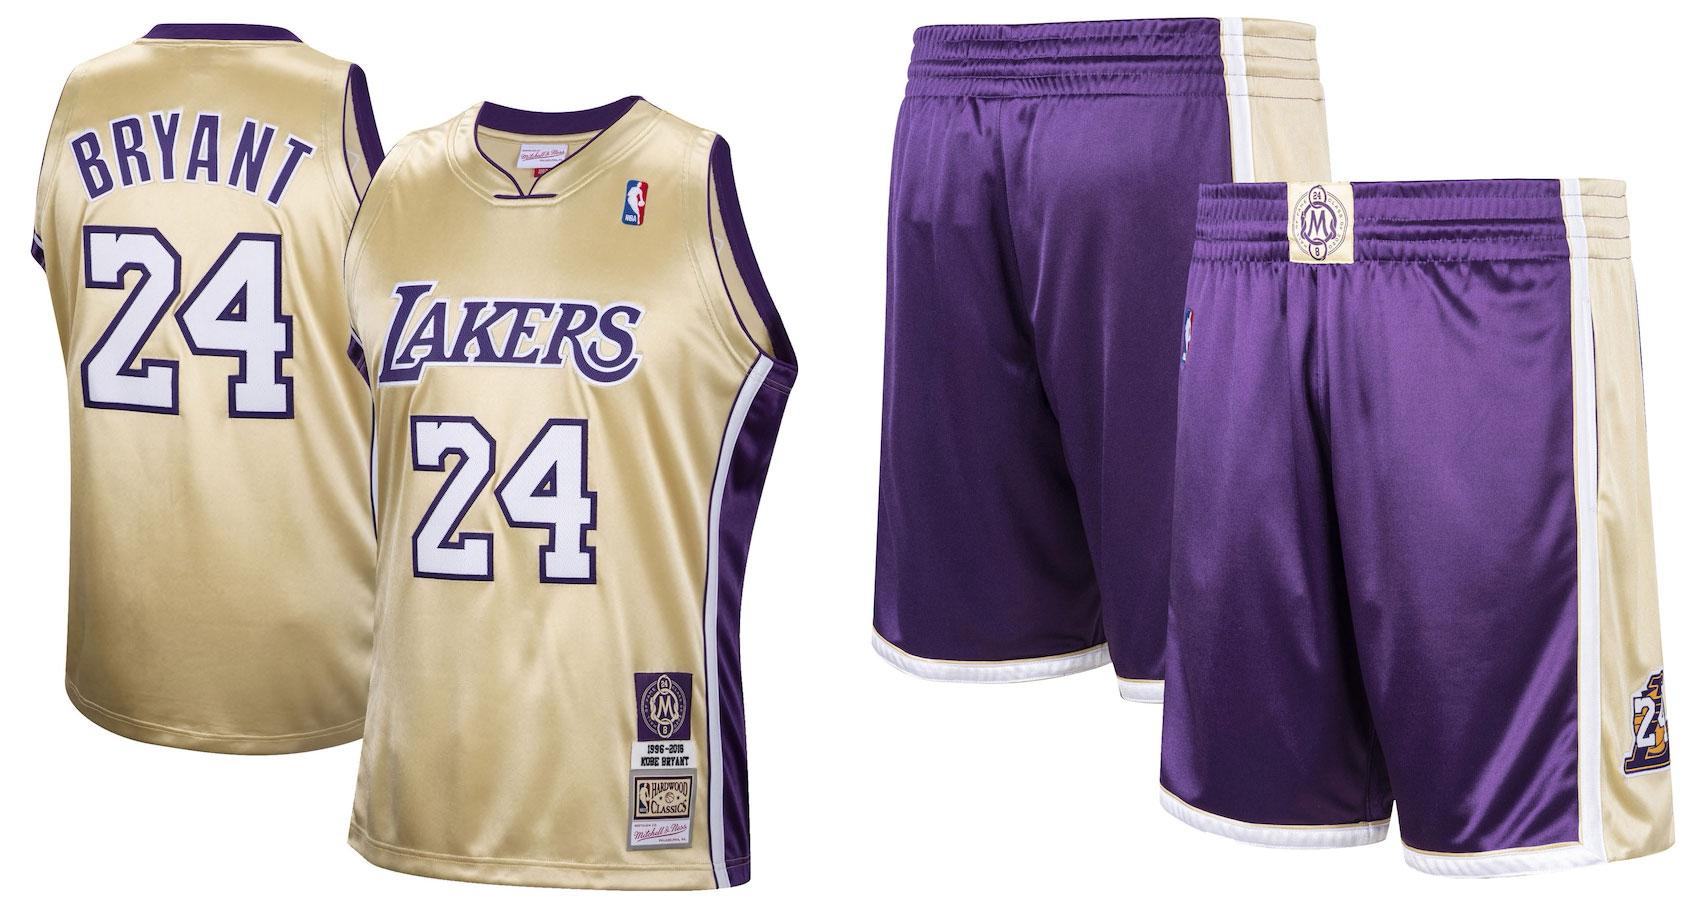 kobe-bryant-hall-of-fame-lakers-jersey-shorts